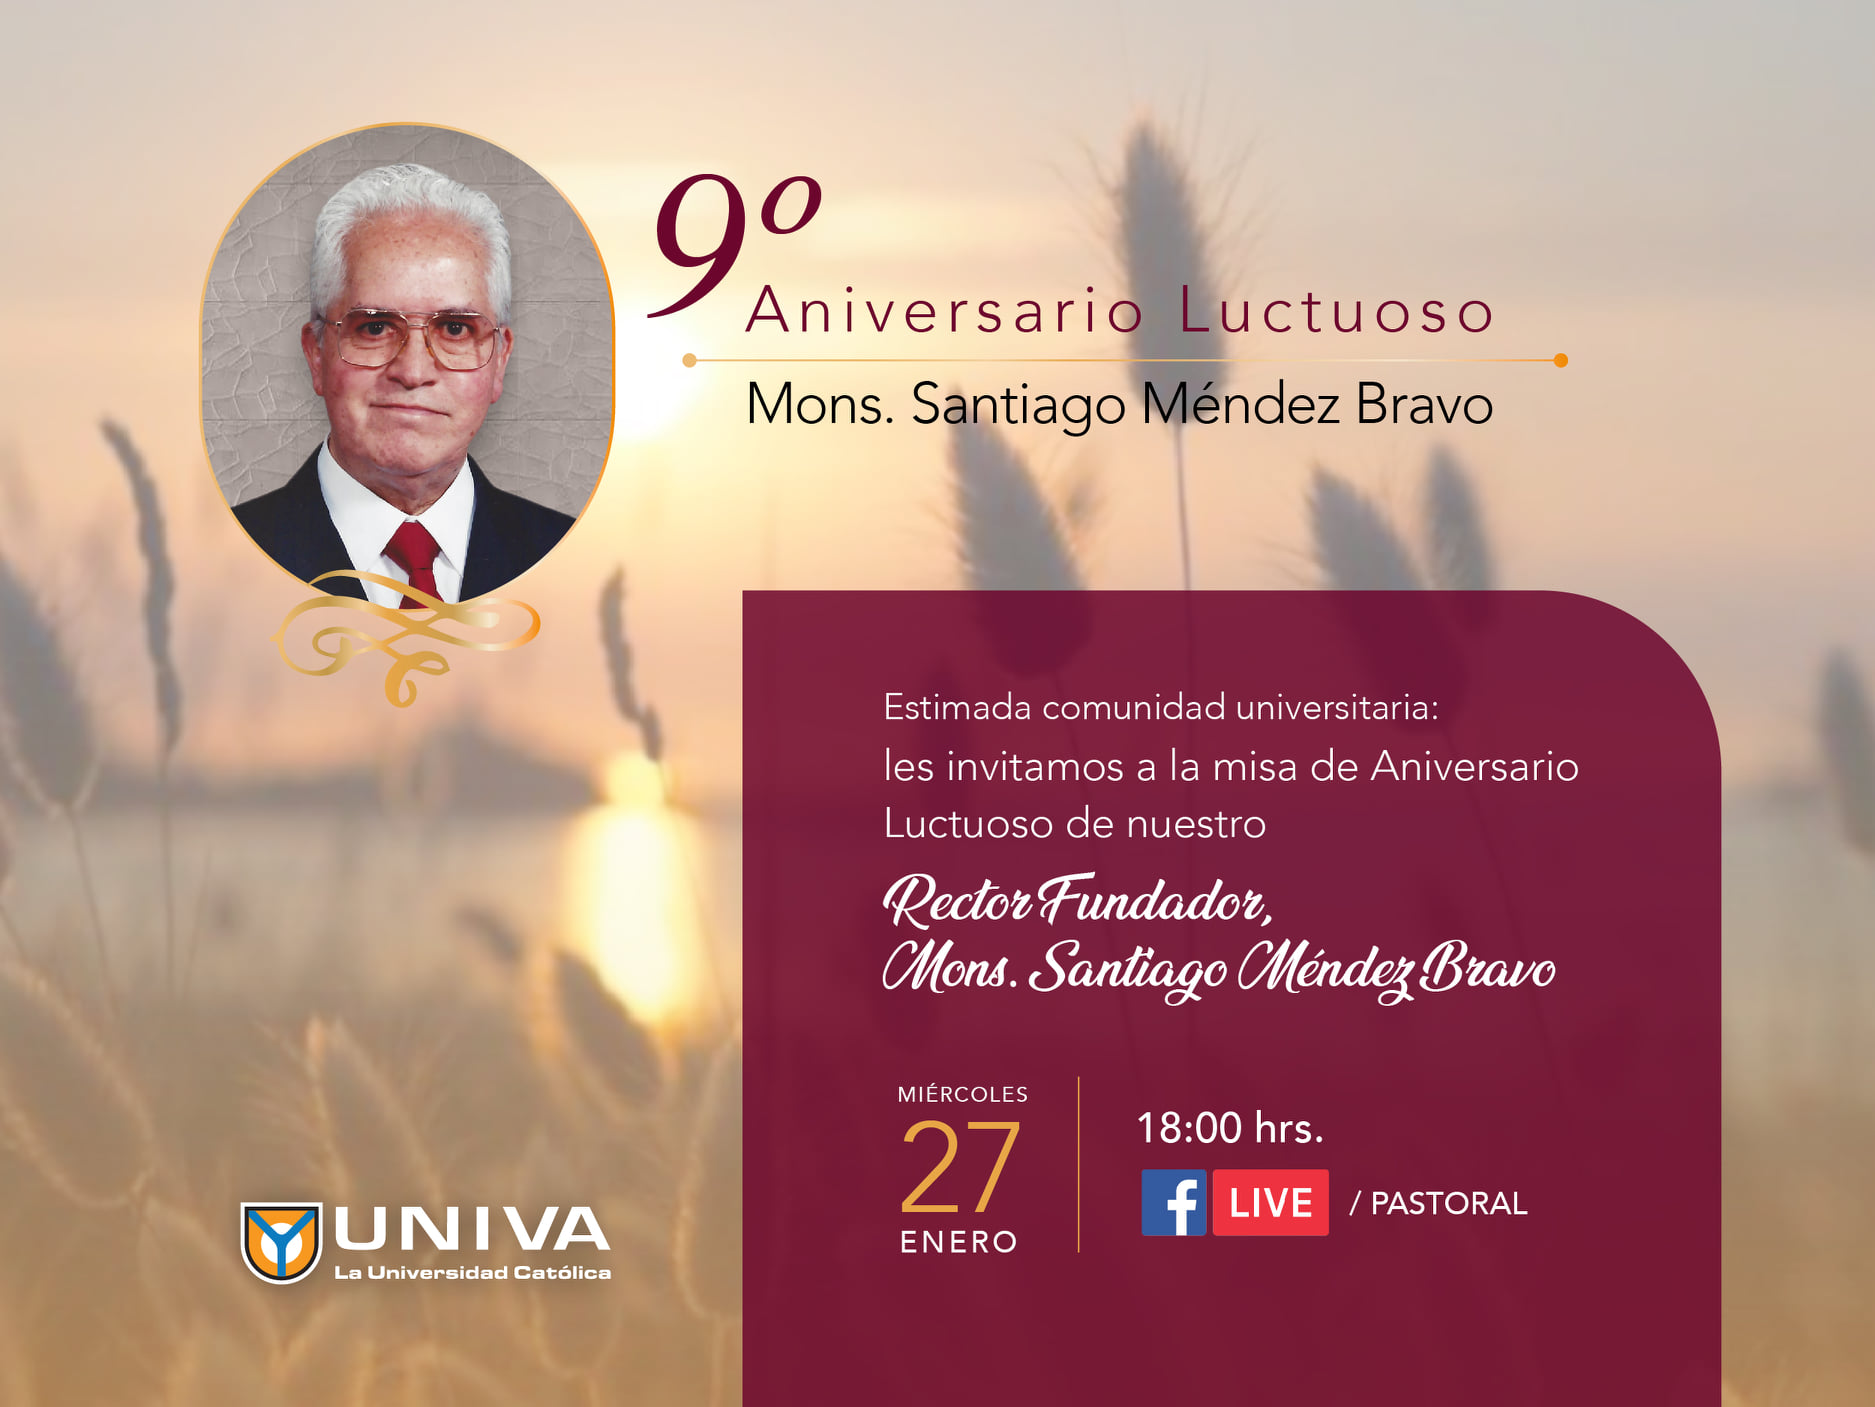 9º Aniversario luctuoso Mons. Santiago Méndez Bravo